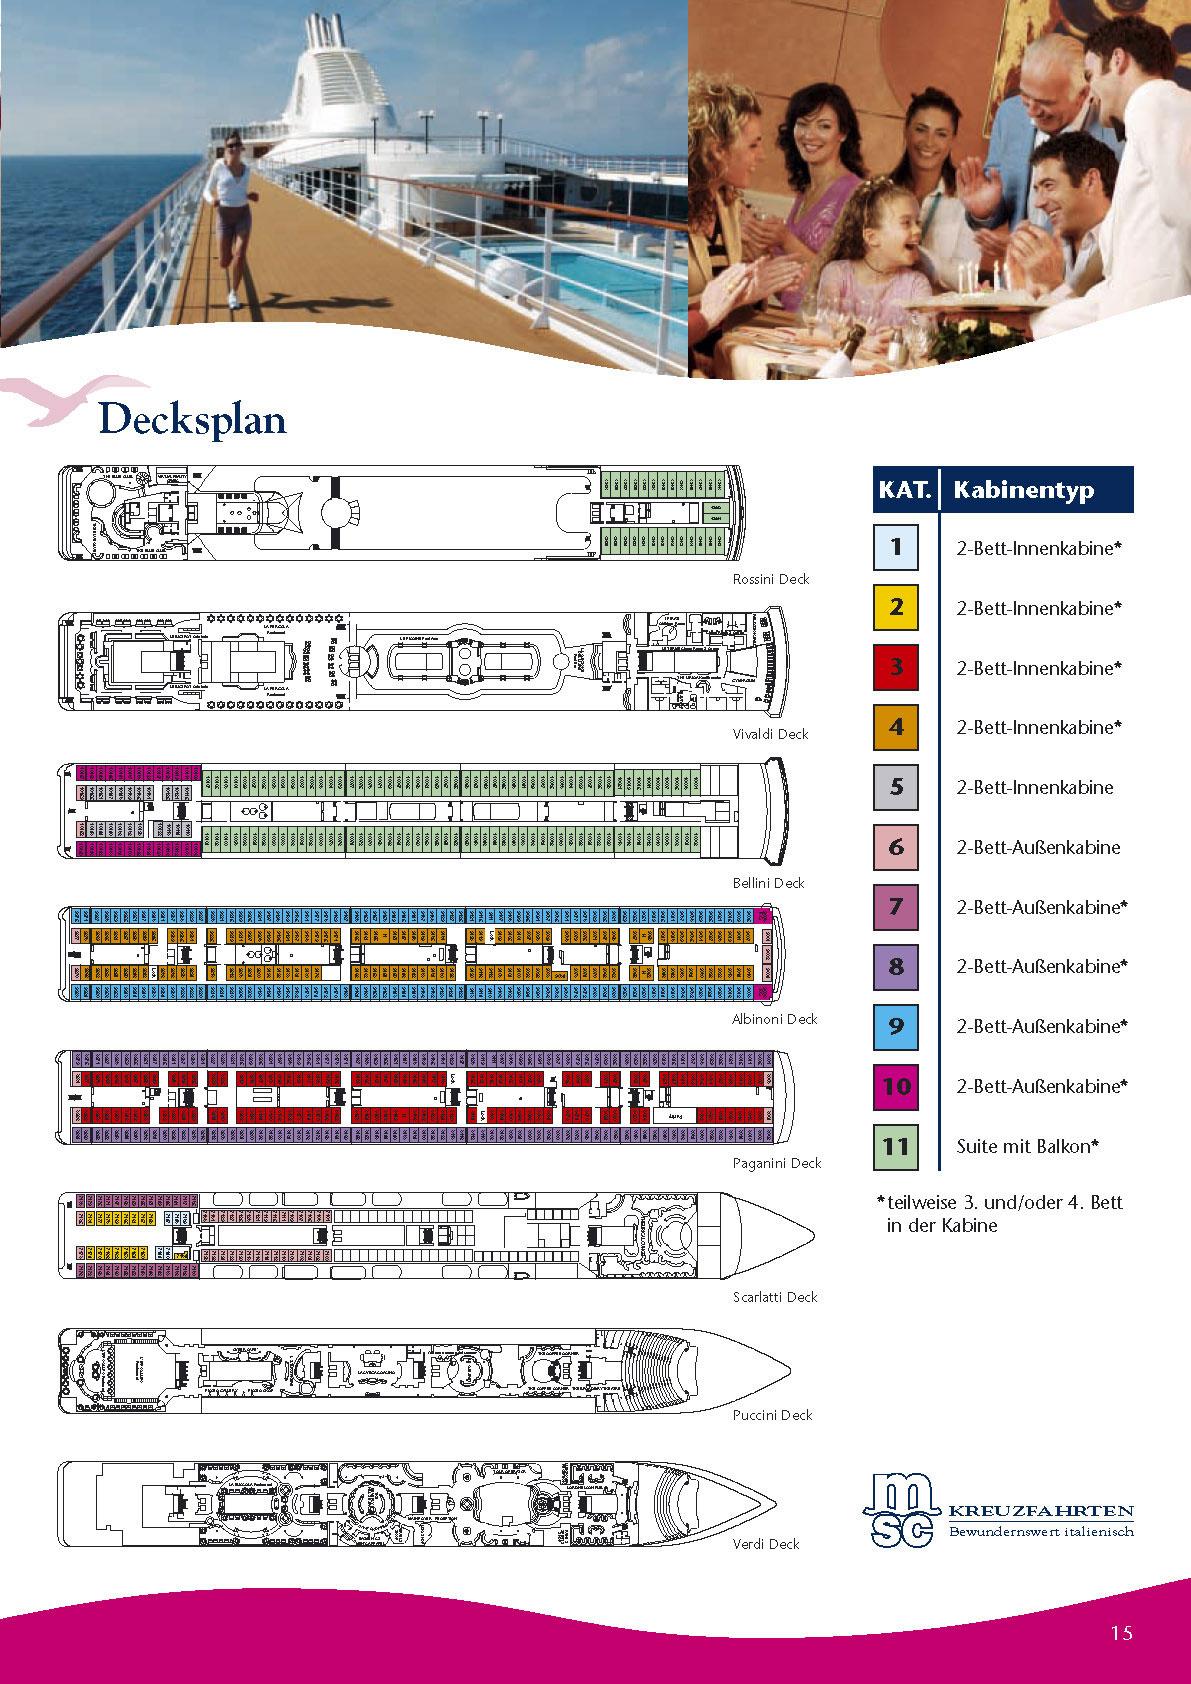 MSC - MSC Lirica Kreuzfahrt, Kreuzfahrtschiff